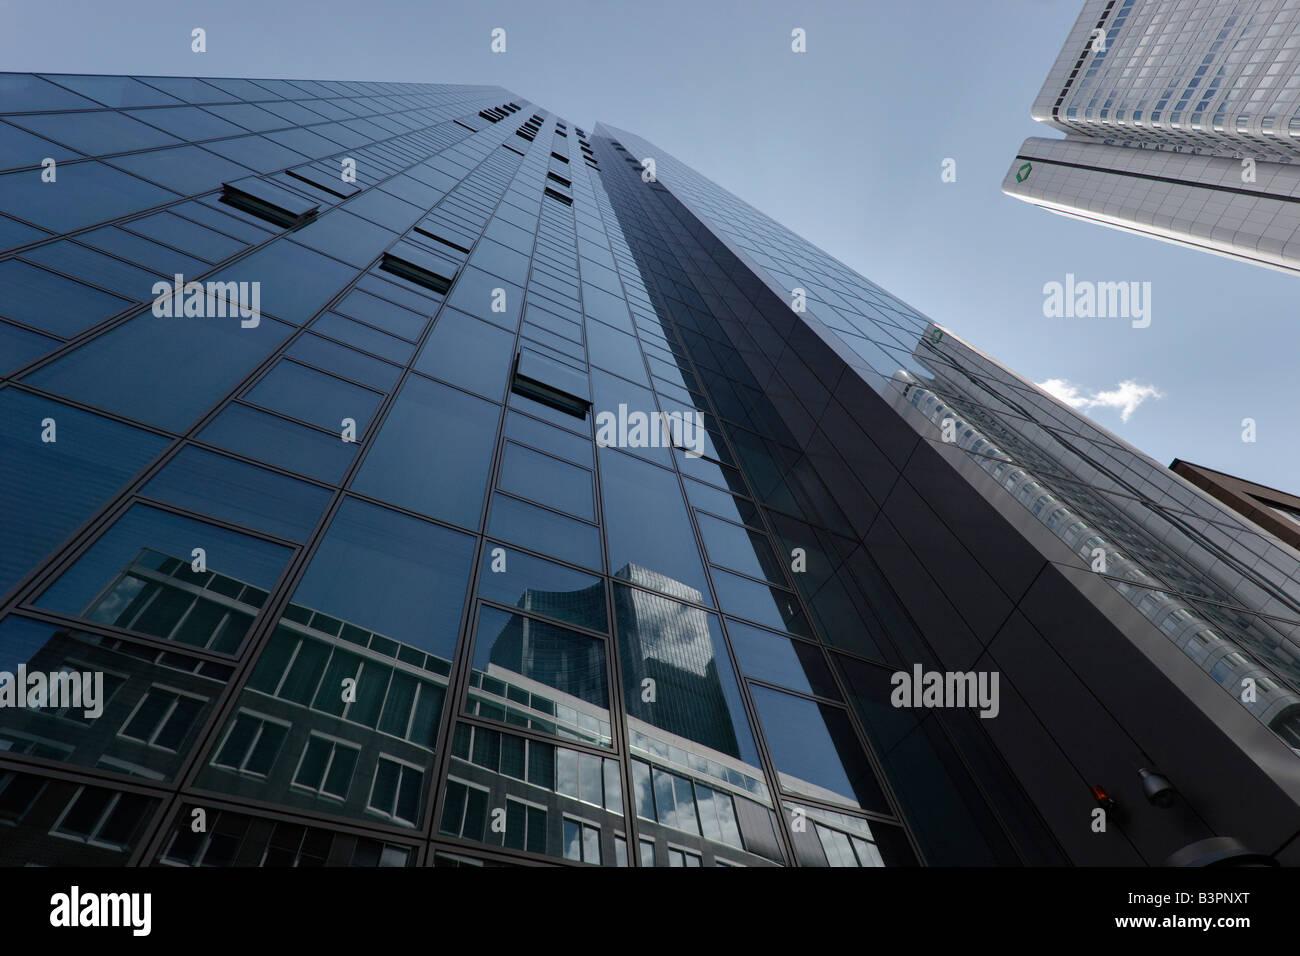 Facade of the Gallileo towerblock and Silver Tower, Dresdner Bank, Frankfurt/Main, Germany, Europe Stock Photo